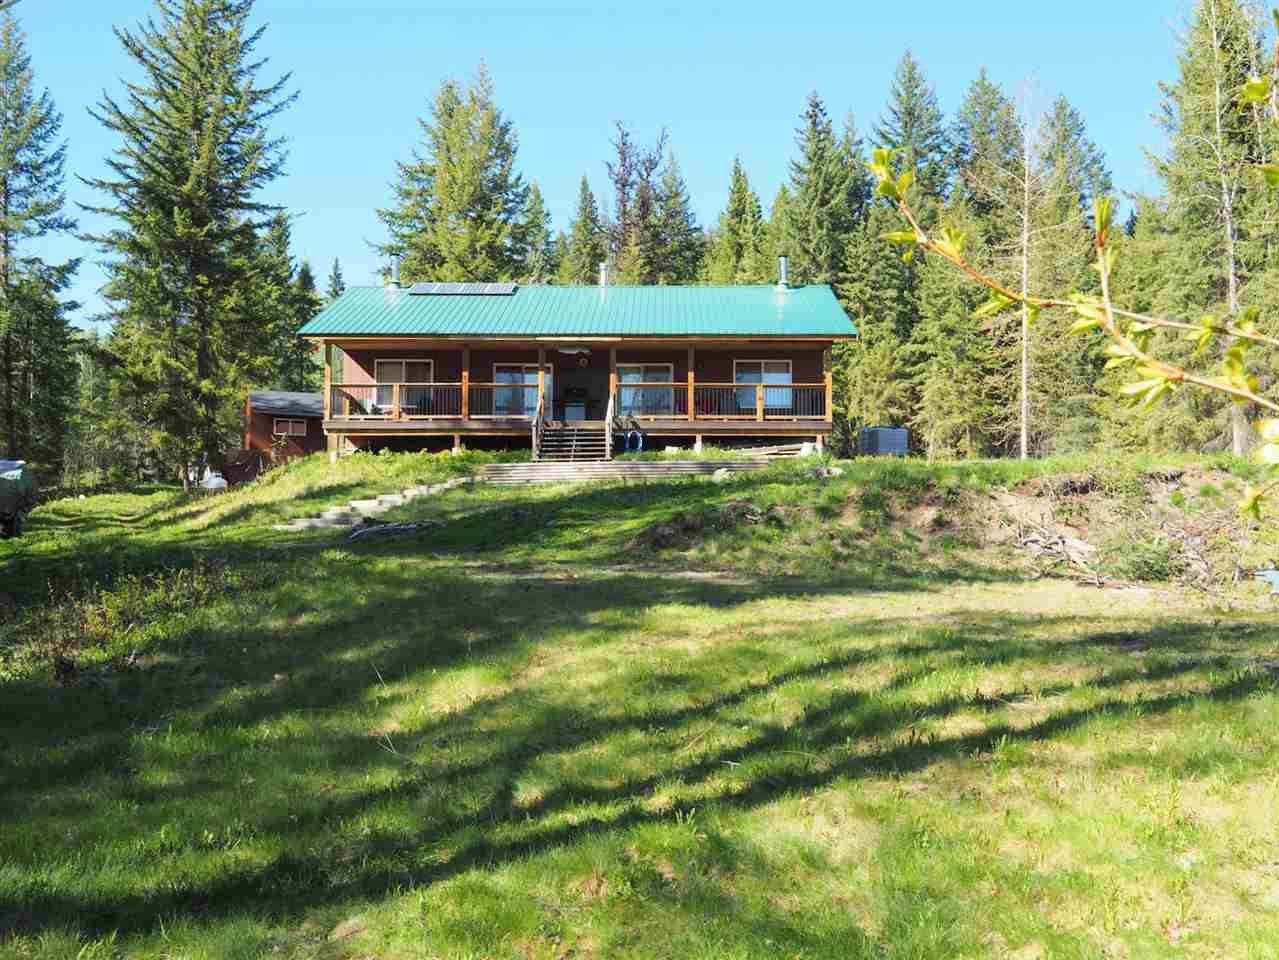 Photo 4: Photos: 8222 CENTENNIAL Road in Bridge Lake: Bridge Lake/Sheridan Lake House for sale (100 Mile House (Zone 10))  : MLS®# R2457362